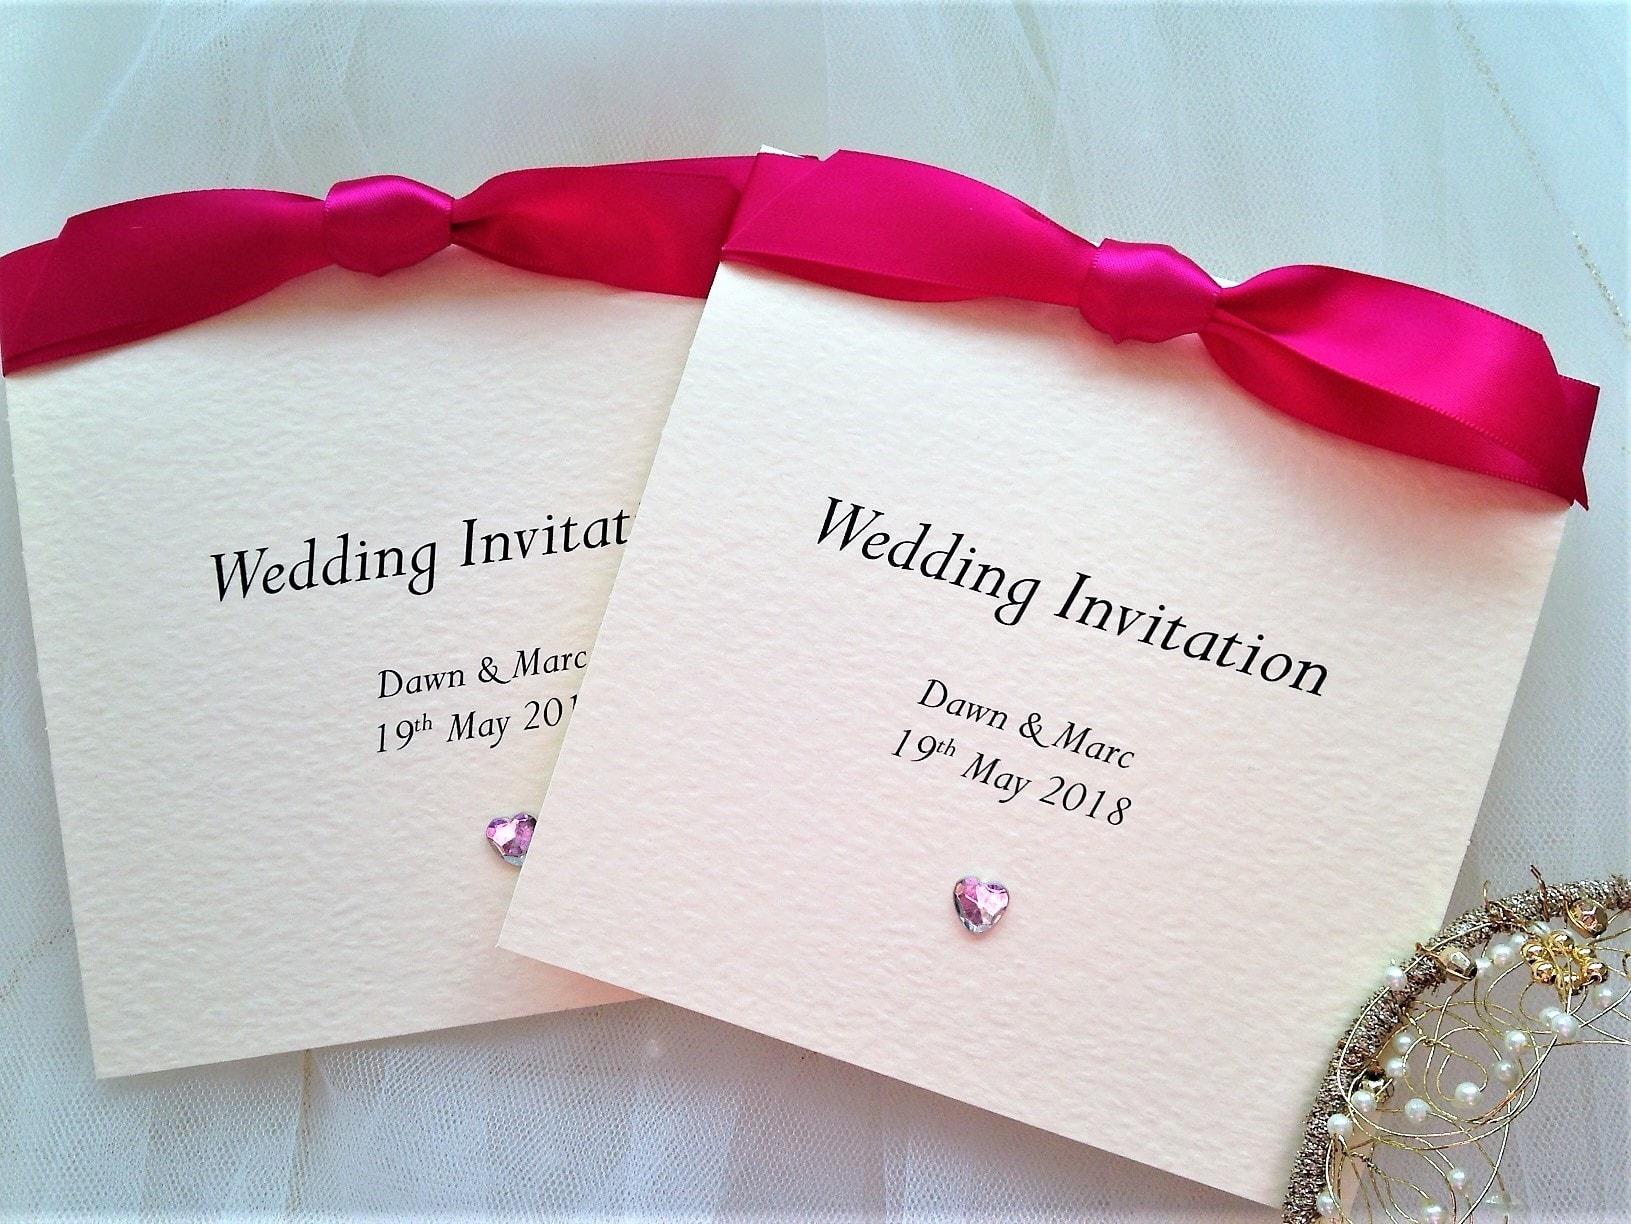 Shop wedding invites by colour to match your wedding colour scheme.